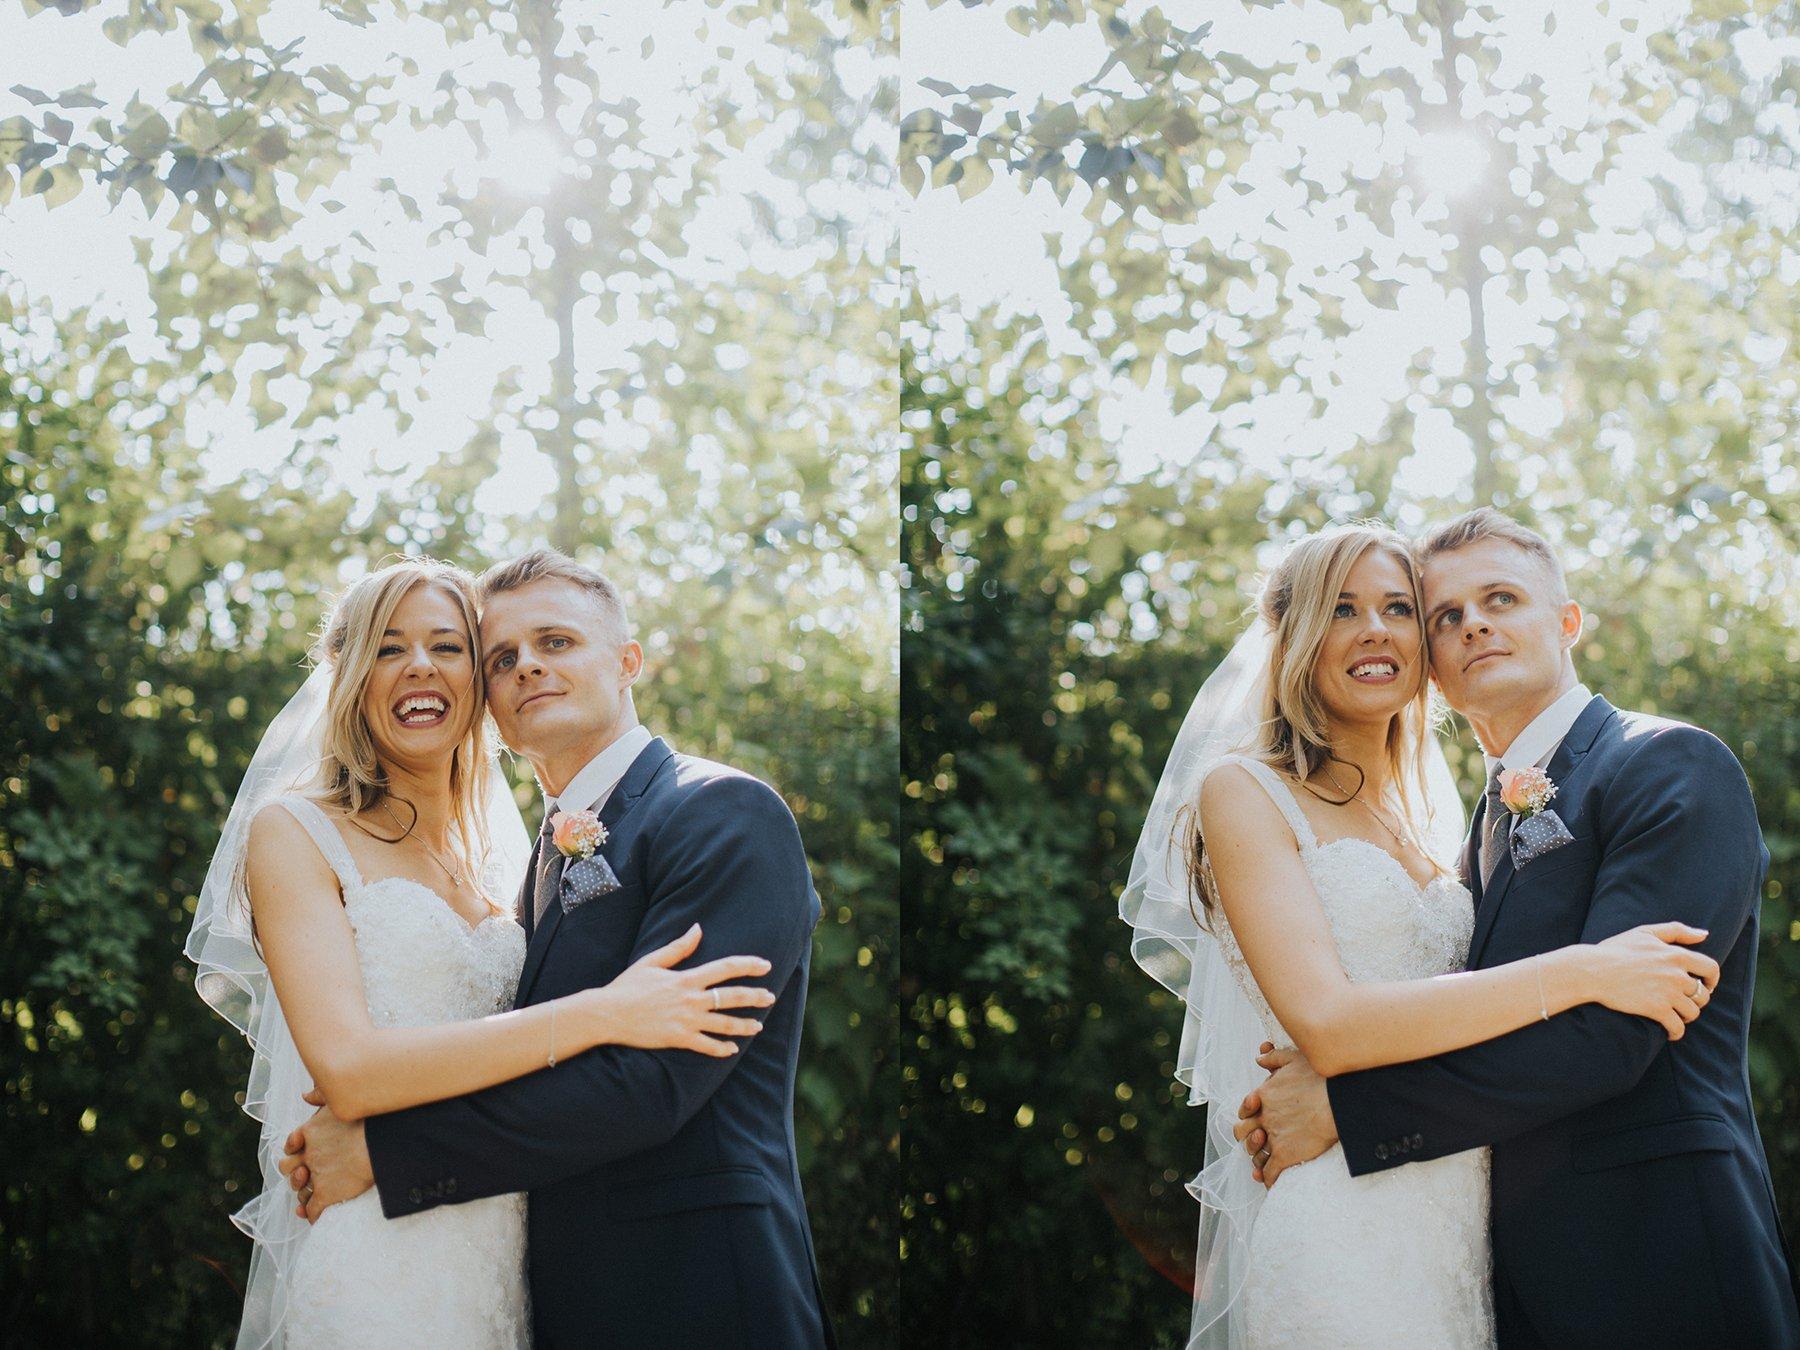 rumbolds-barn-wedding-photography-fazackarley-jess-chris-095